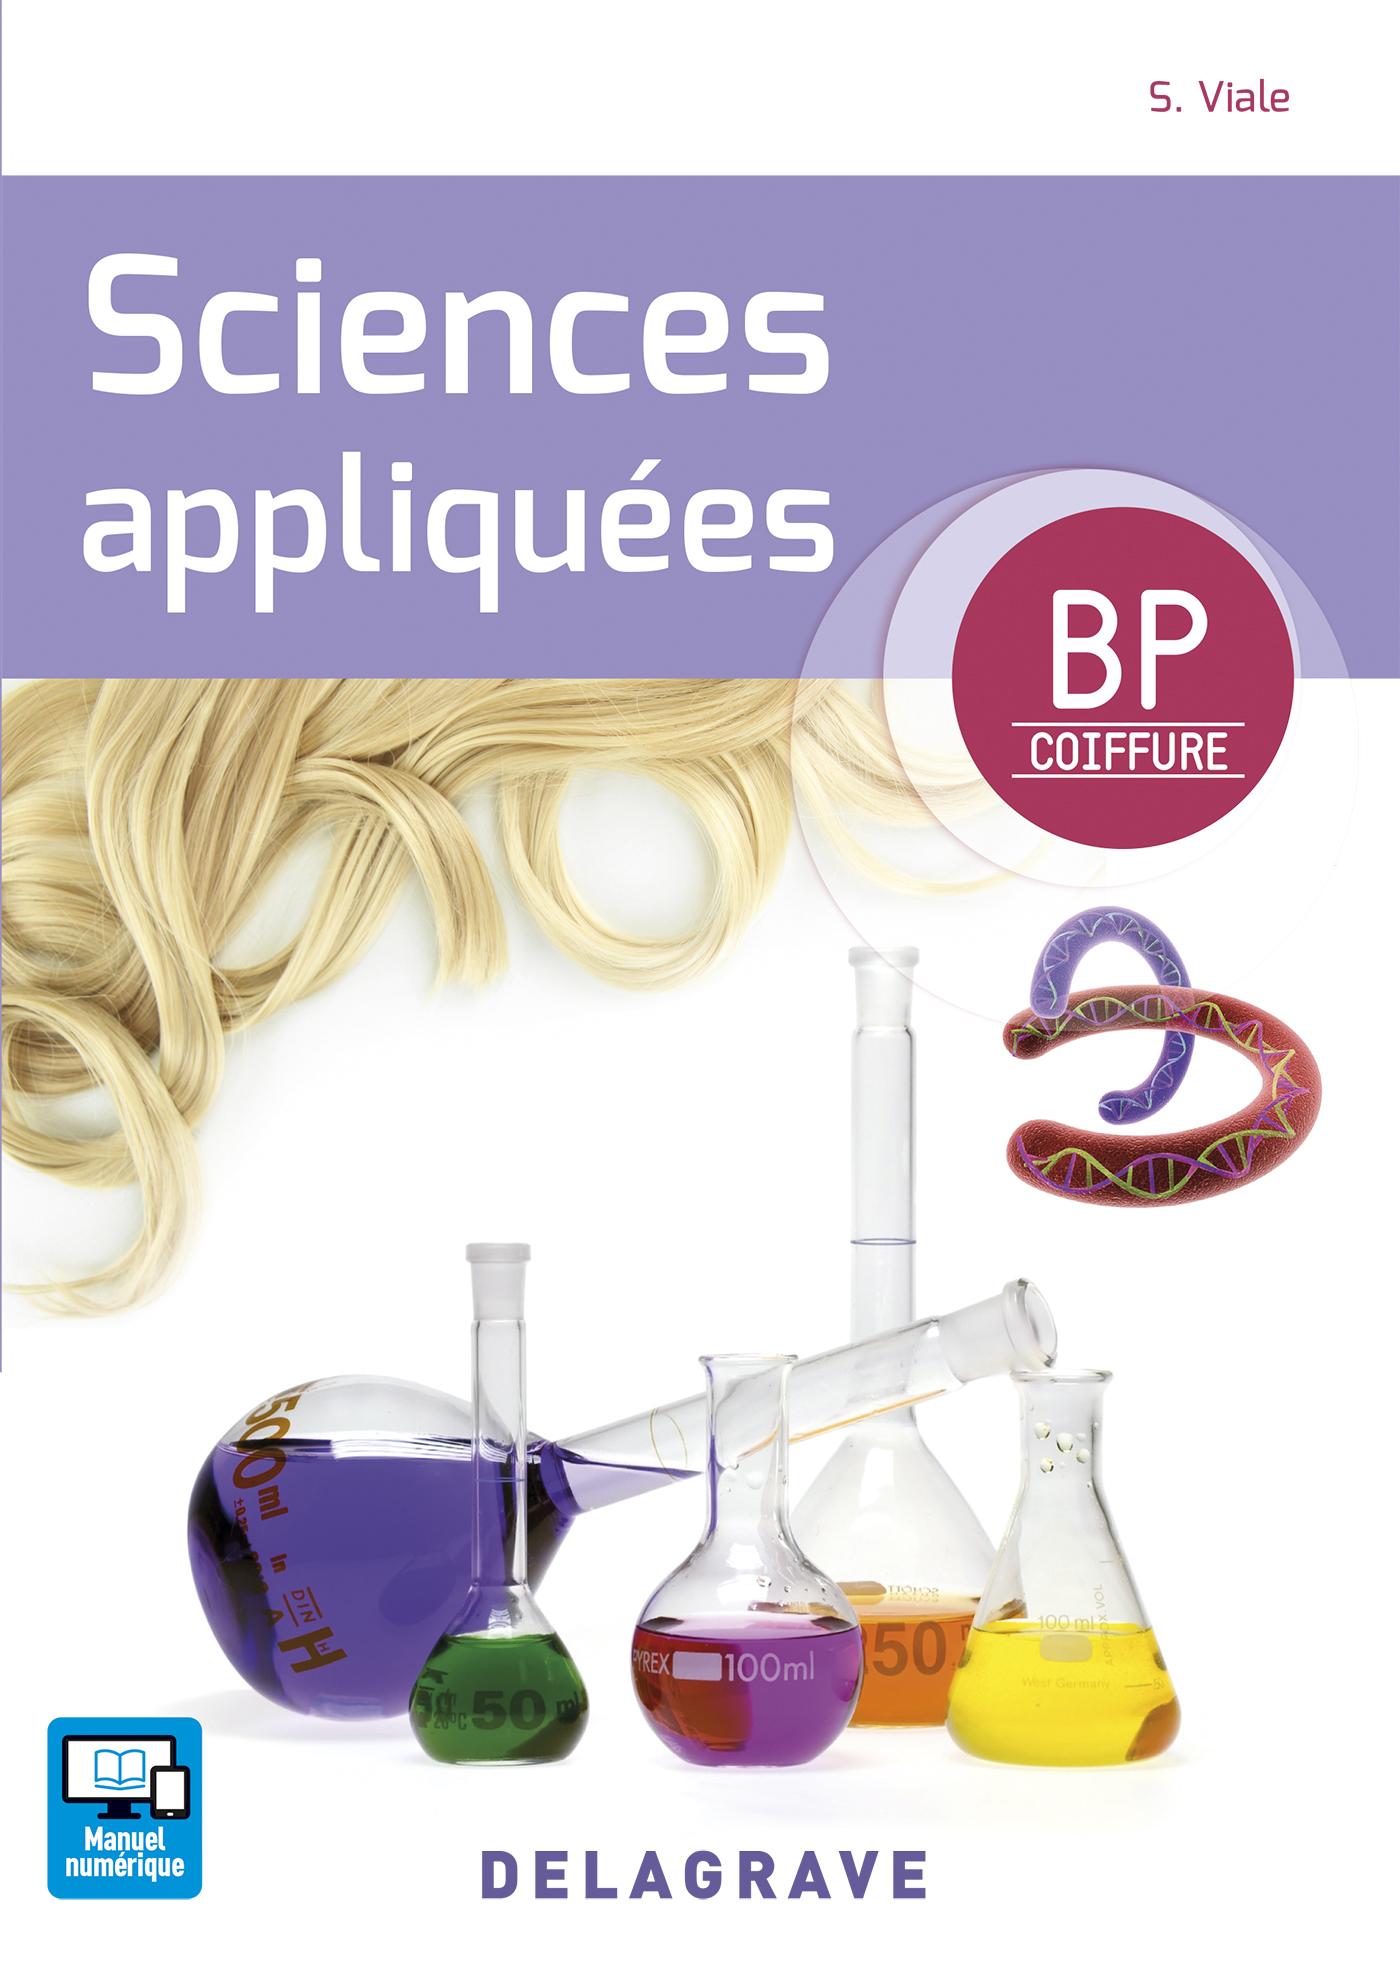 Sciences appliqu es bp coiffure 2016 manuel l ve for Sciences appliquees cap cuisine